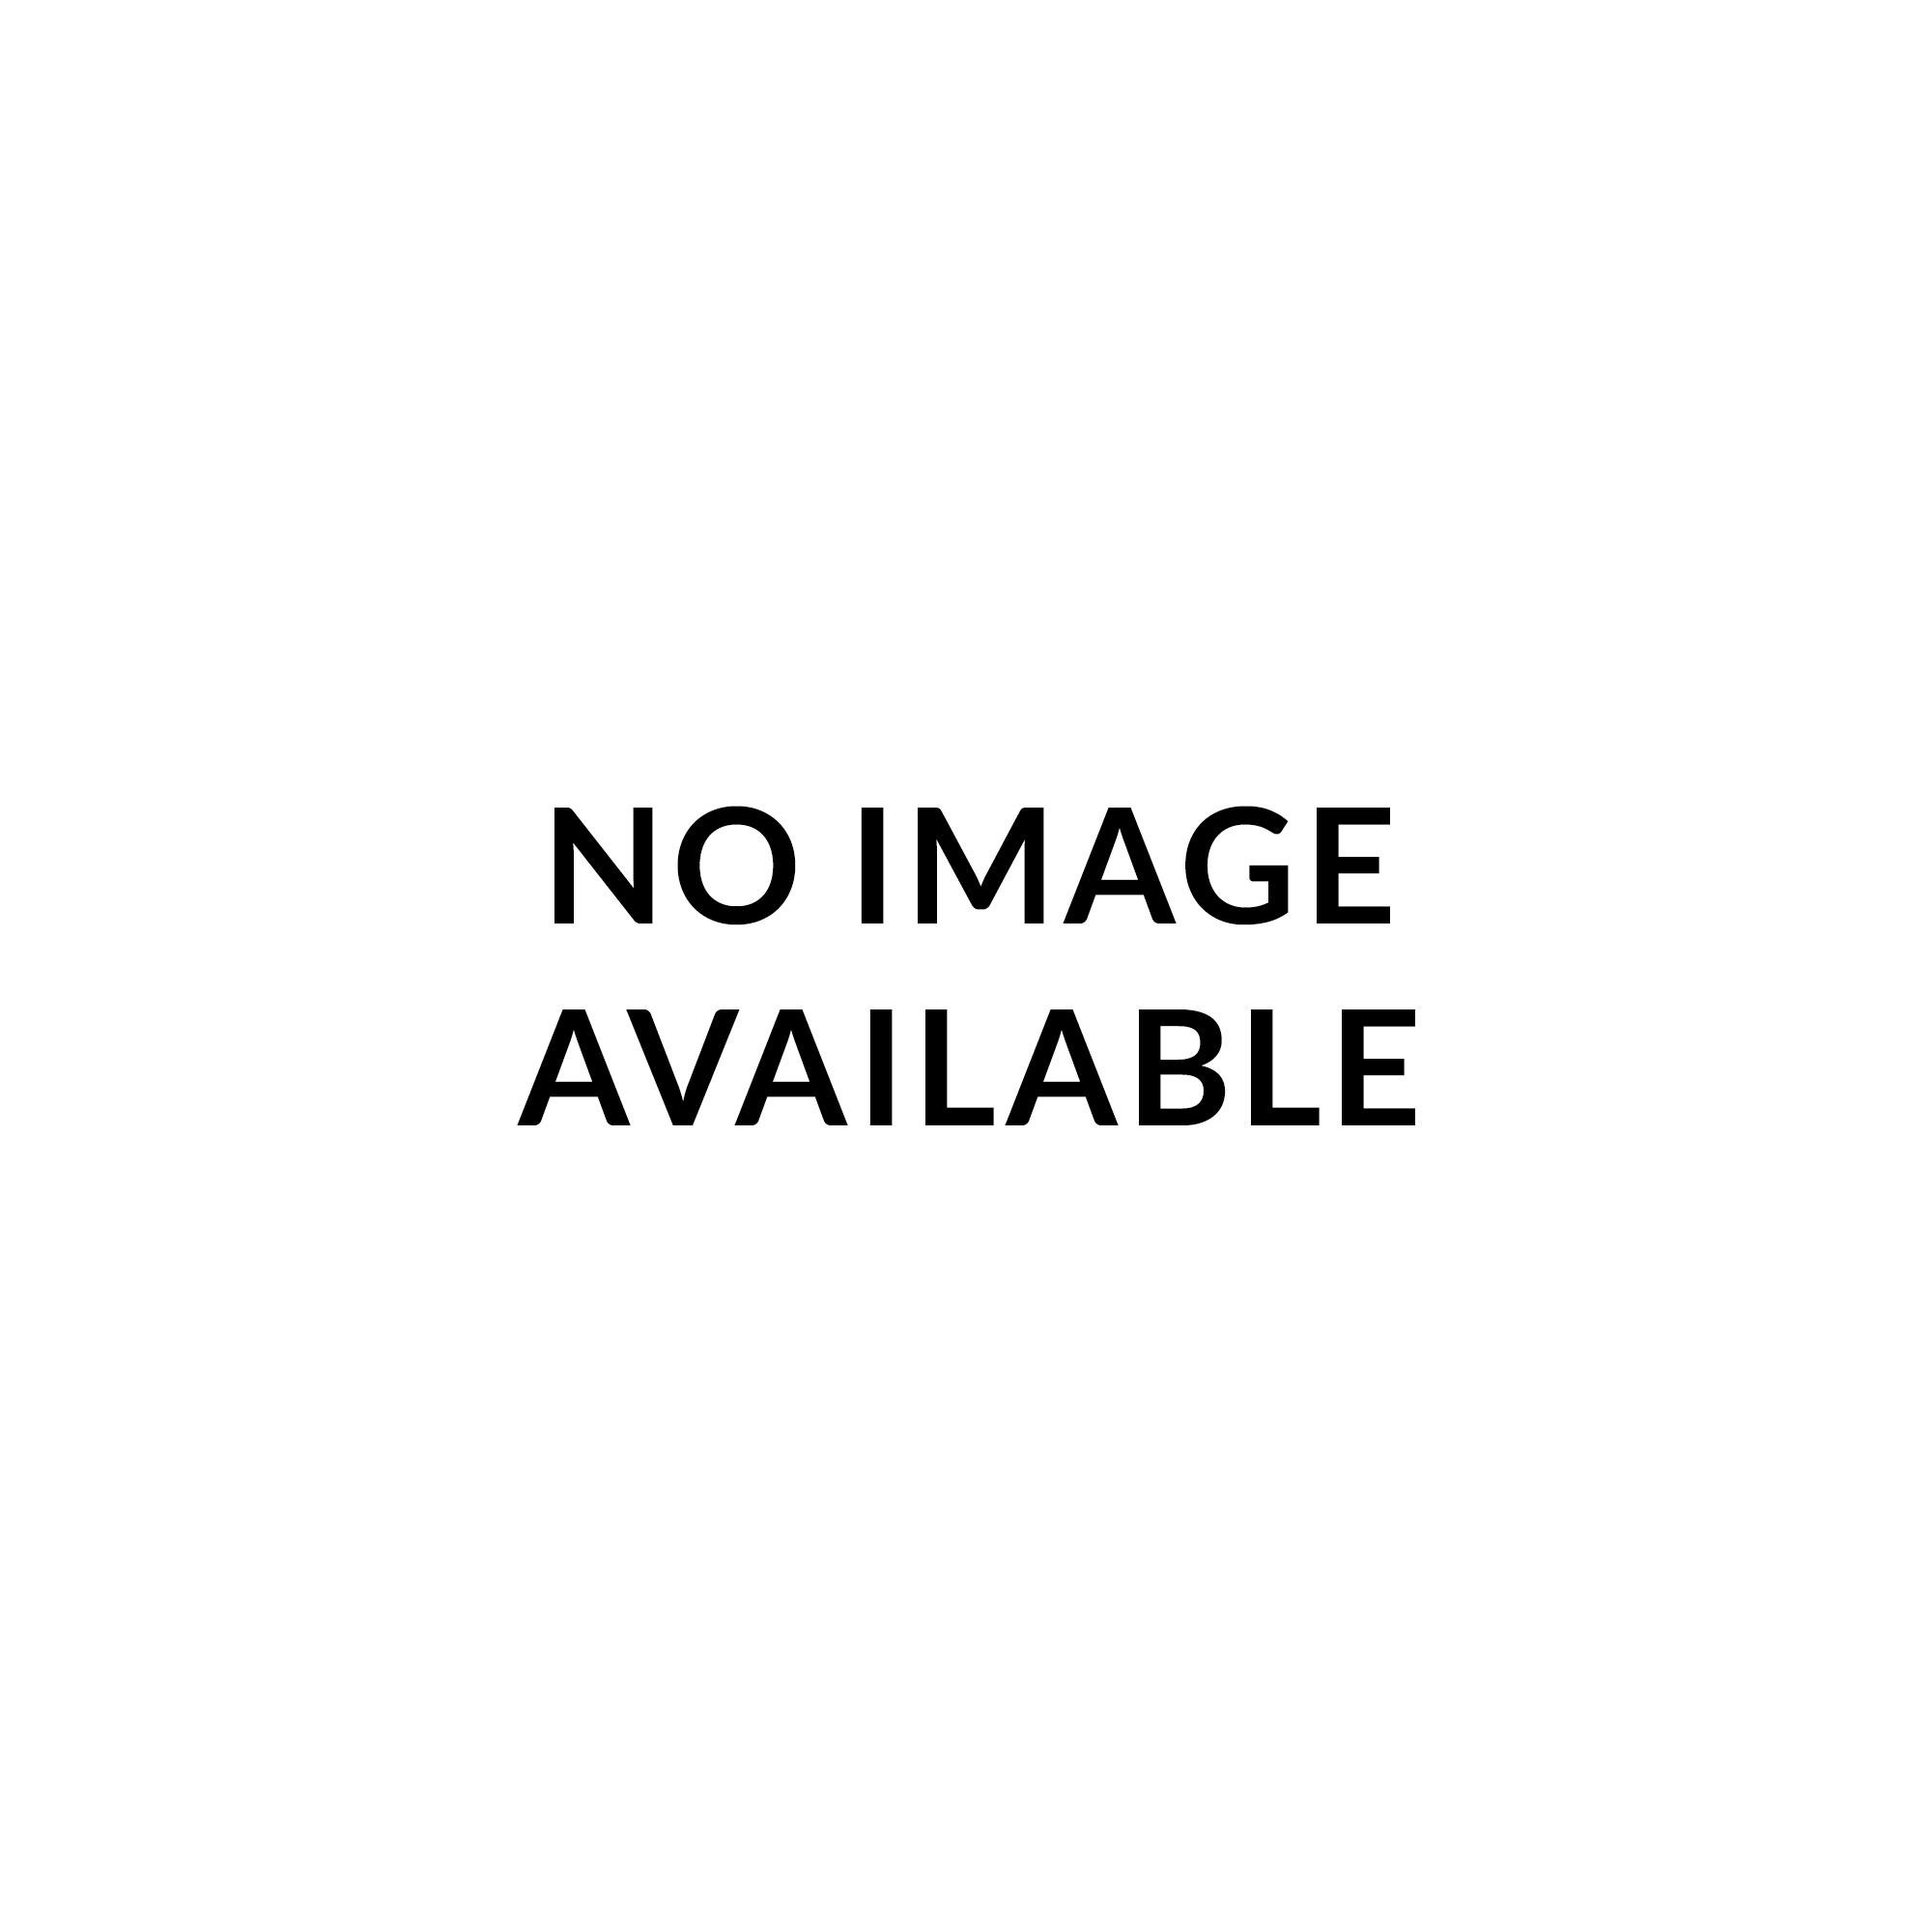 D'Addario PSB105 ProSteels XL Bass Single String .105 Long Scale